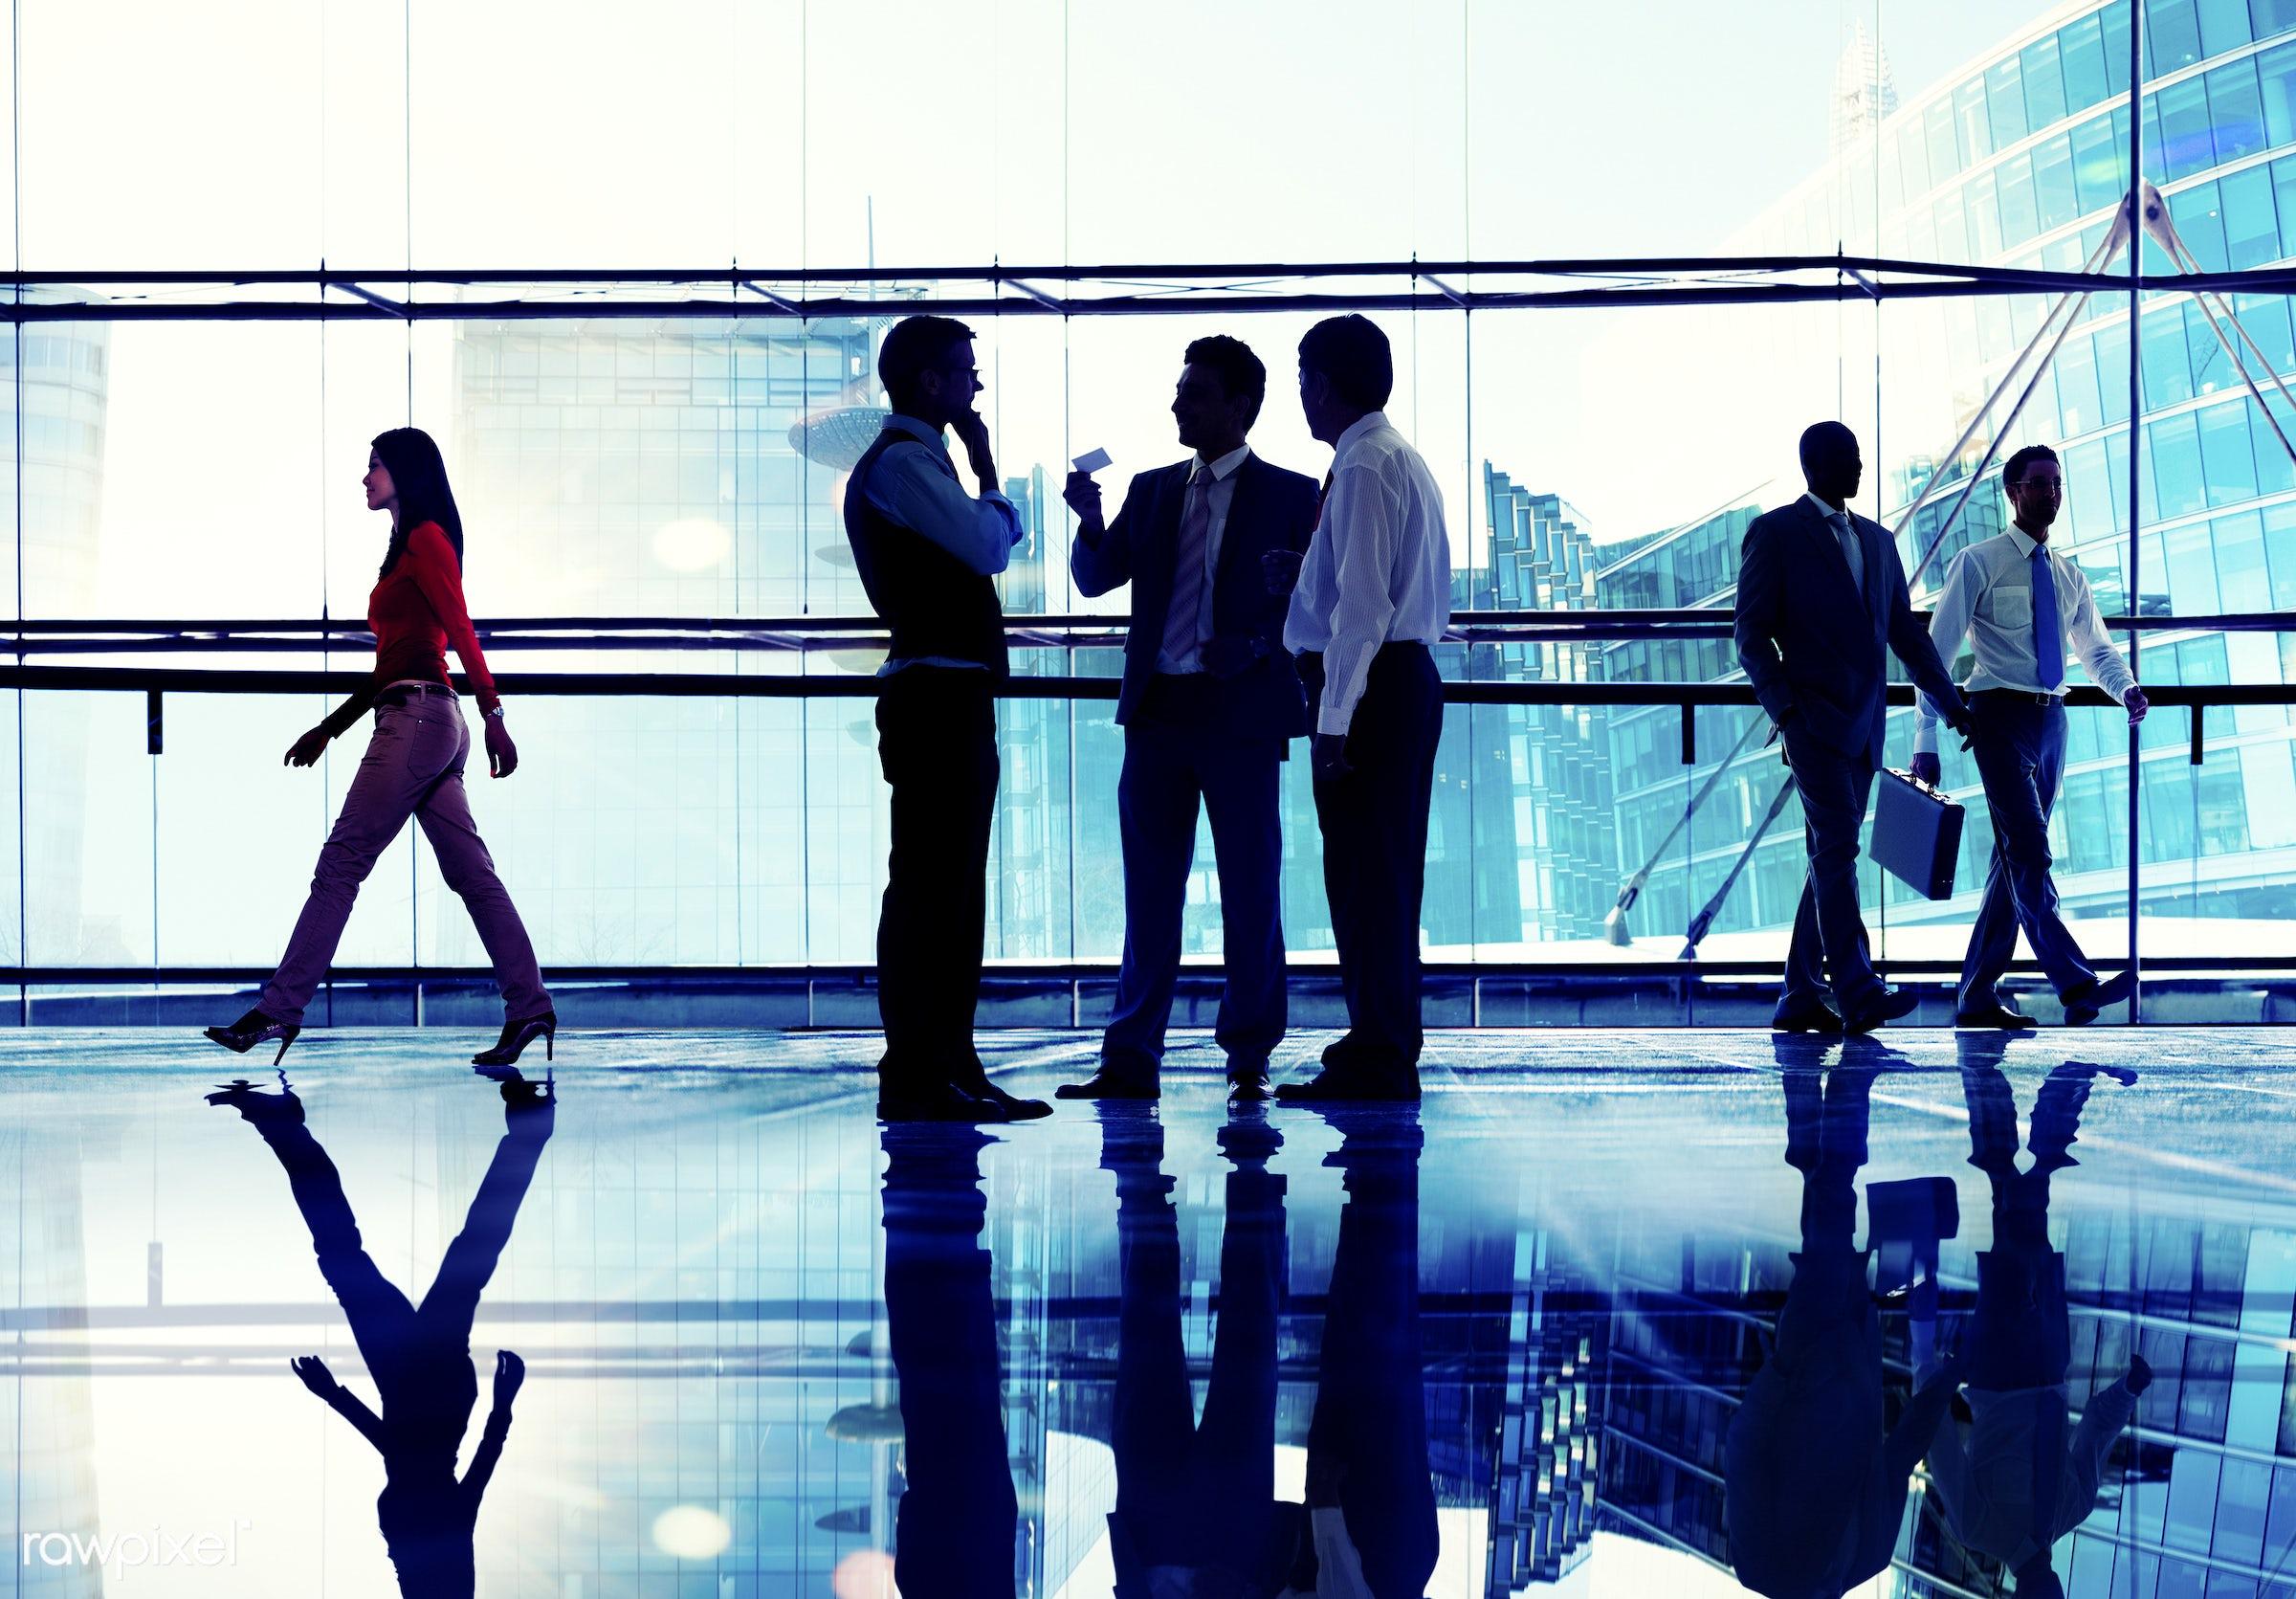 brainstorming, building, business, business people, businessmen, businesswomen, busy, city, cityscape, colleague,...